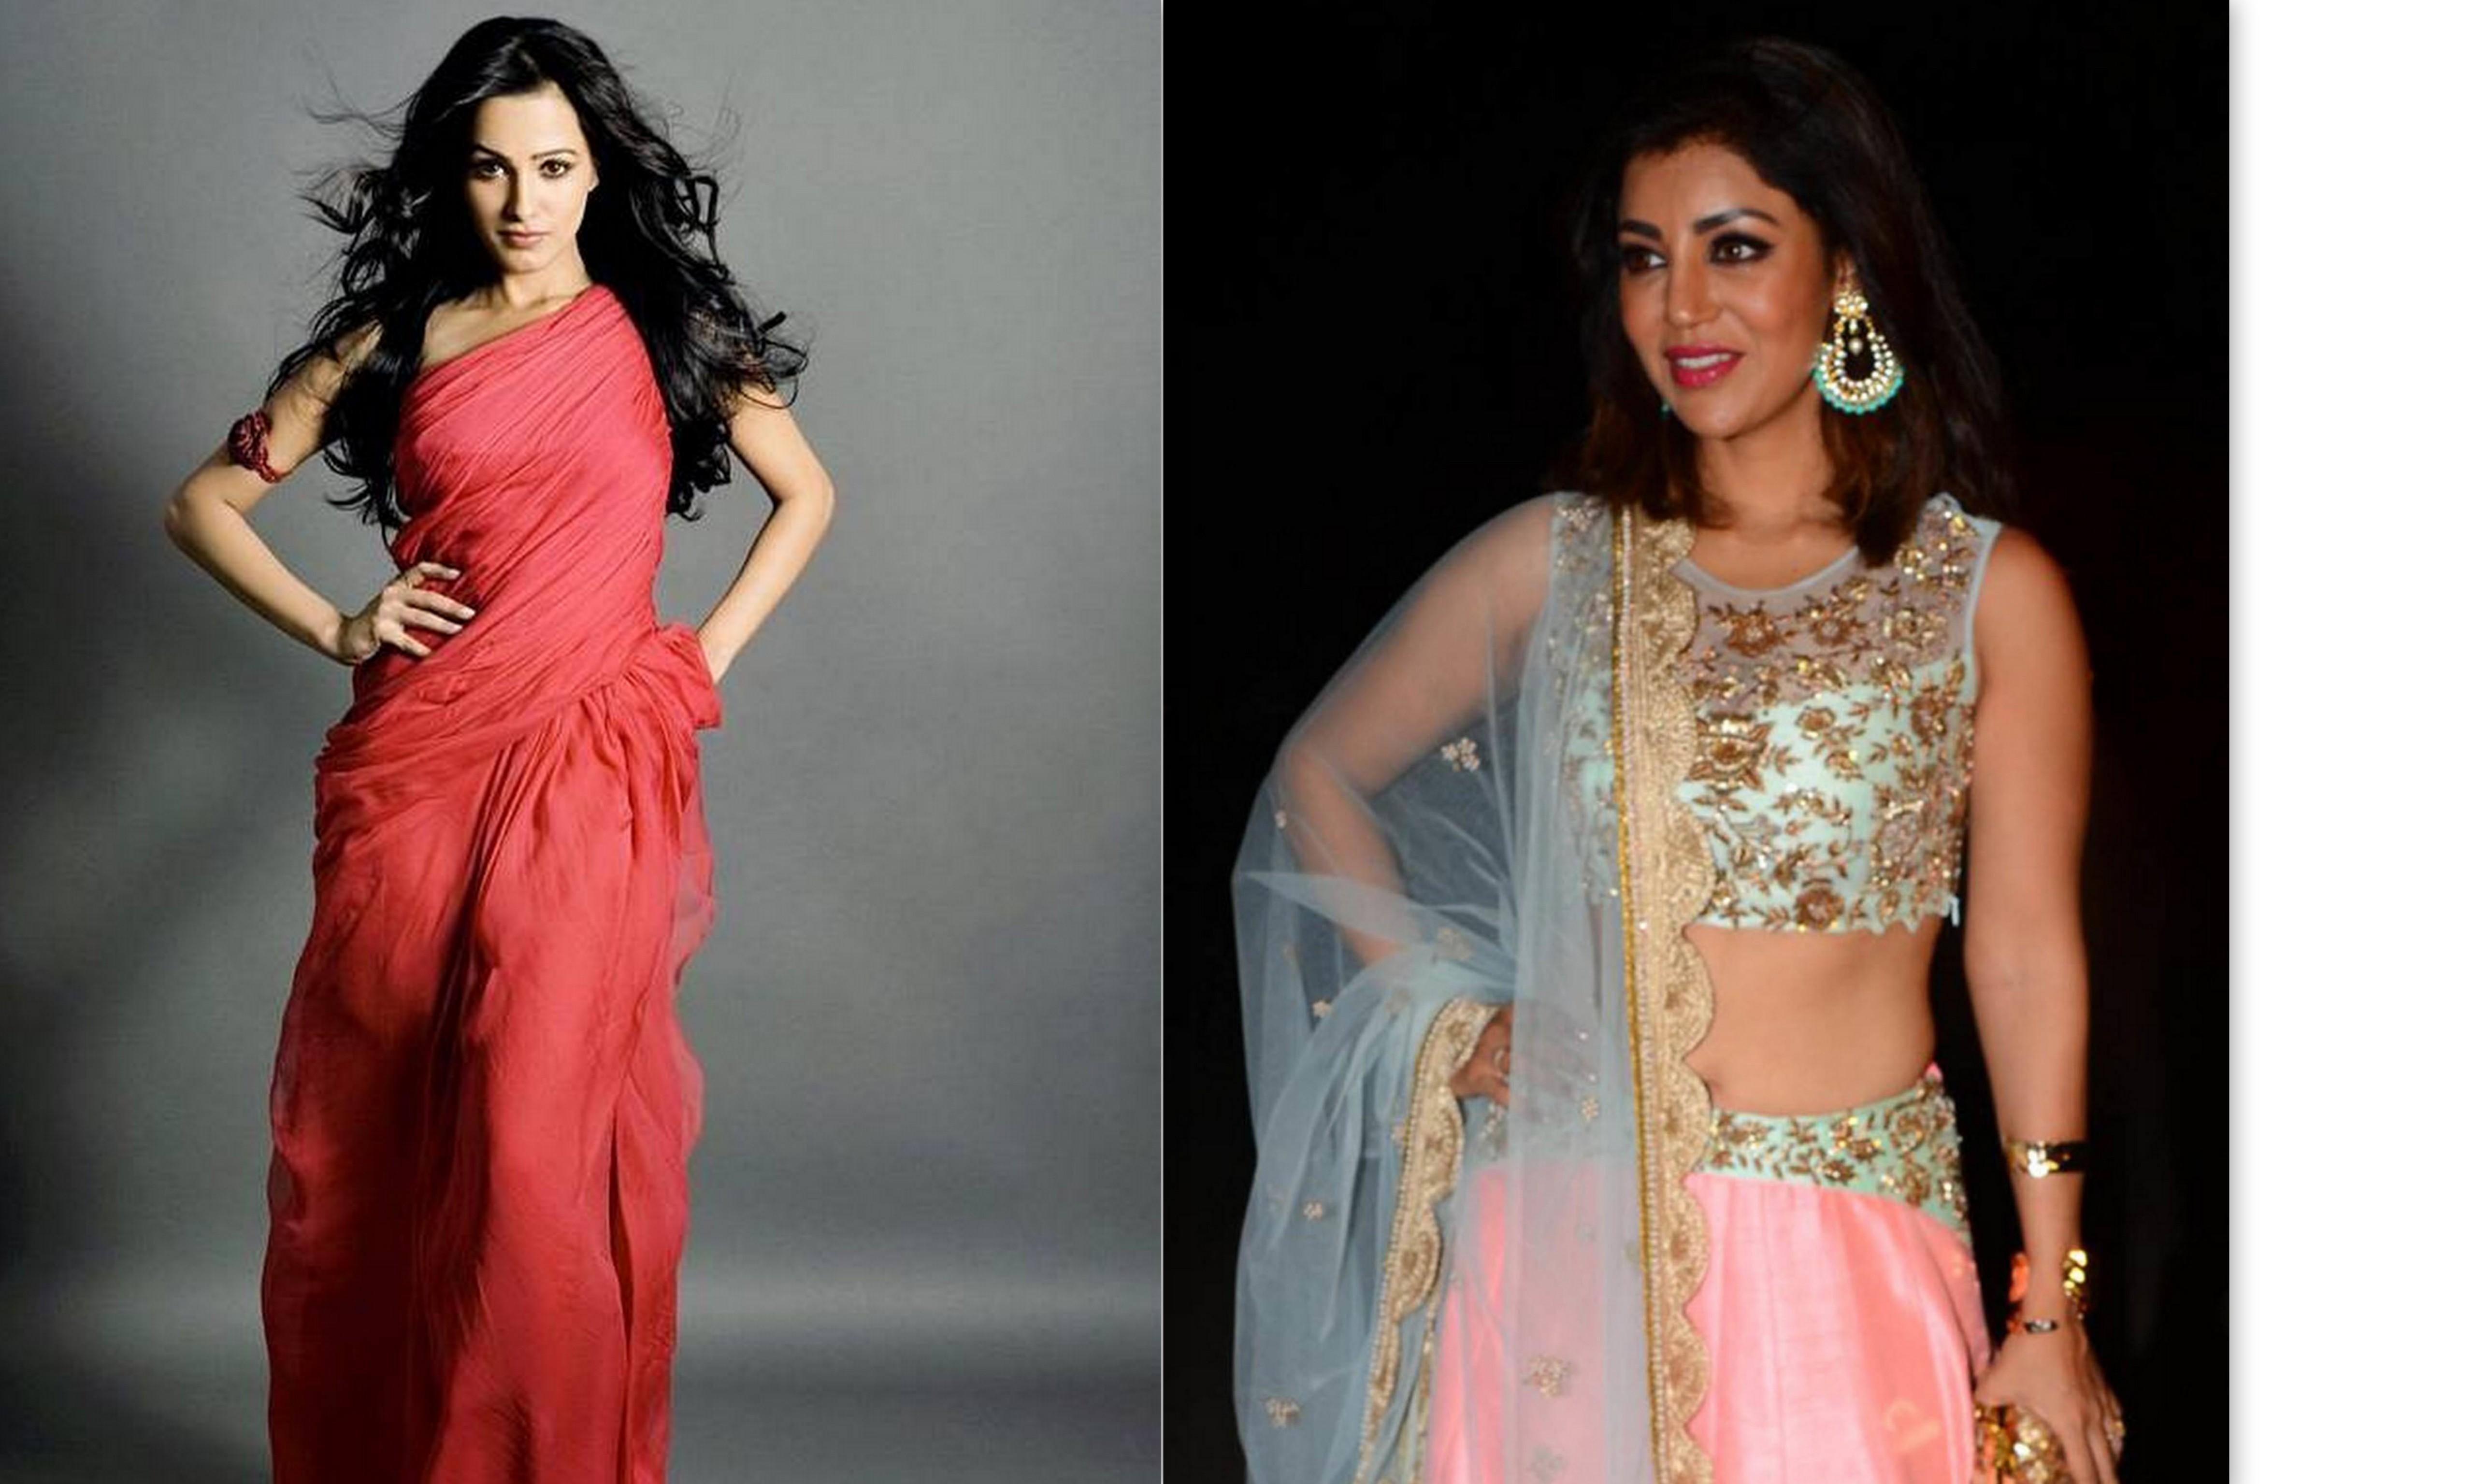 Anita Hasnandani, Debina Bonnerjee to appear in 'Comedy Dangal'!